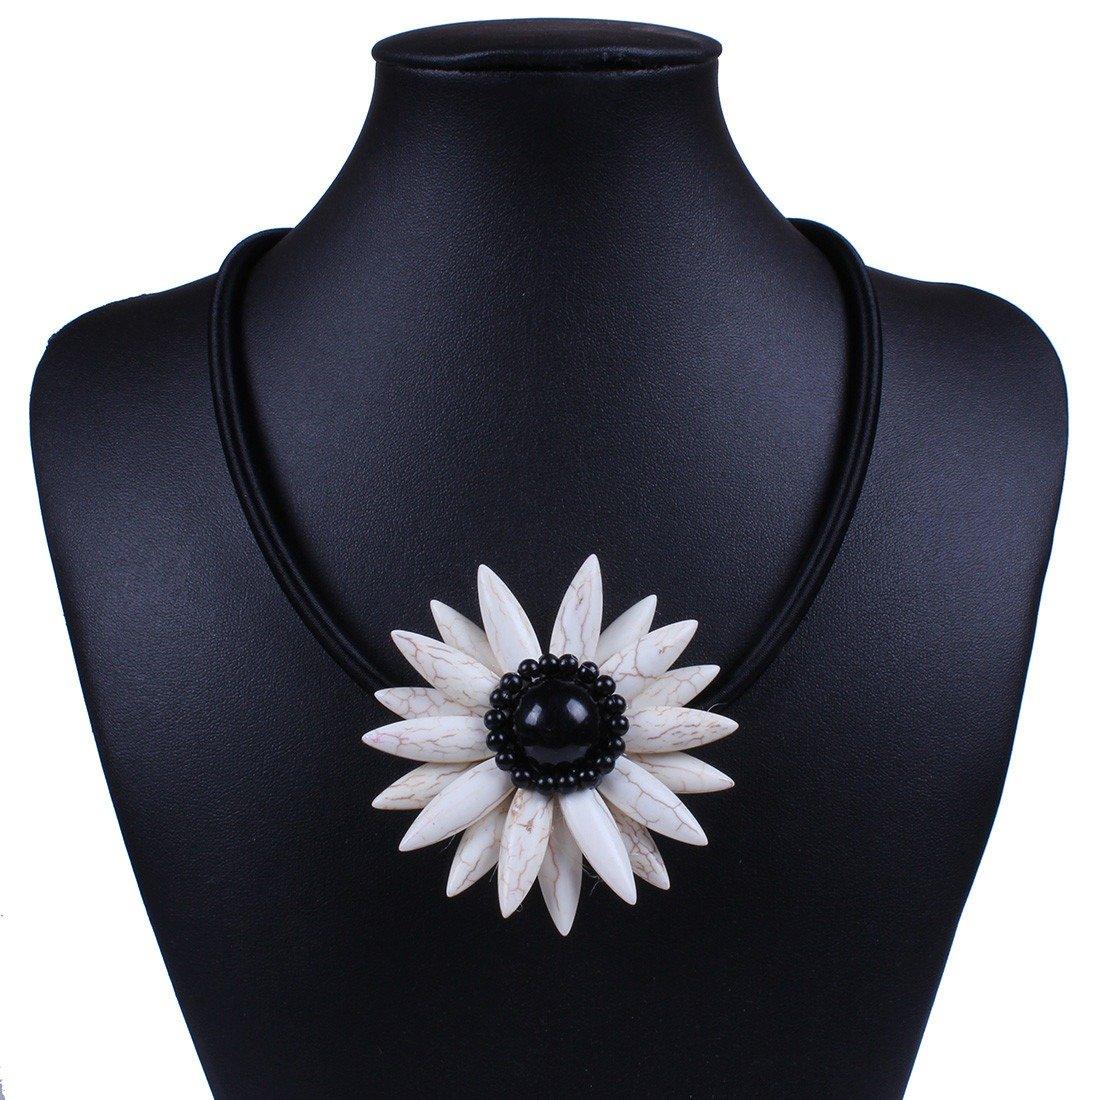 Qiyun Handmade Black Rope Cord Turquoise Blue Stone Bead Flower Pendant Necklace Noir Corde Cordon Bleu Turquoise Fleur Pierre Collier W005N1177